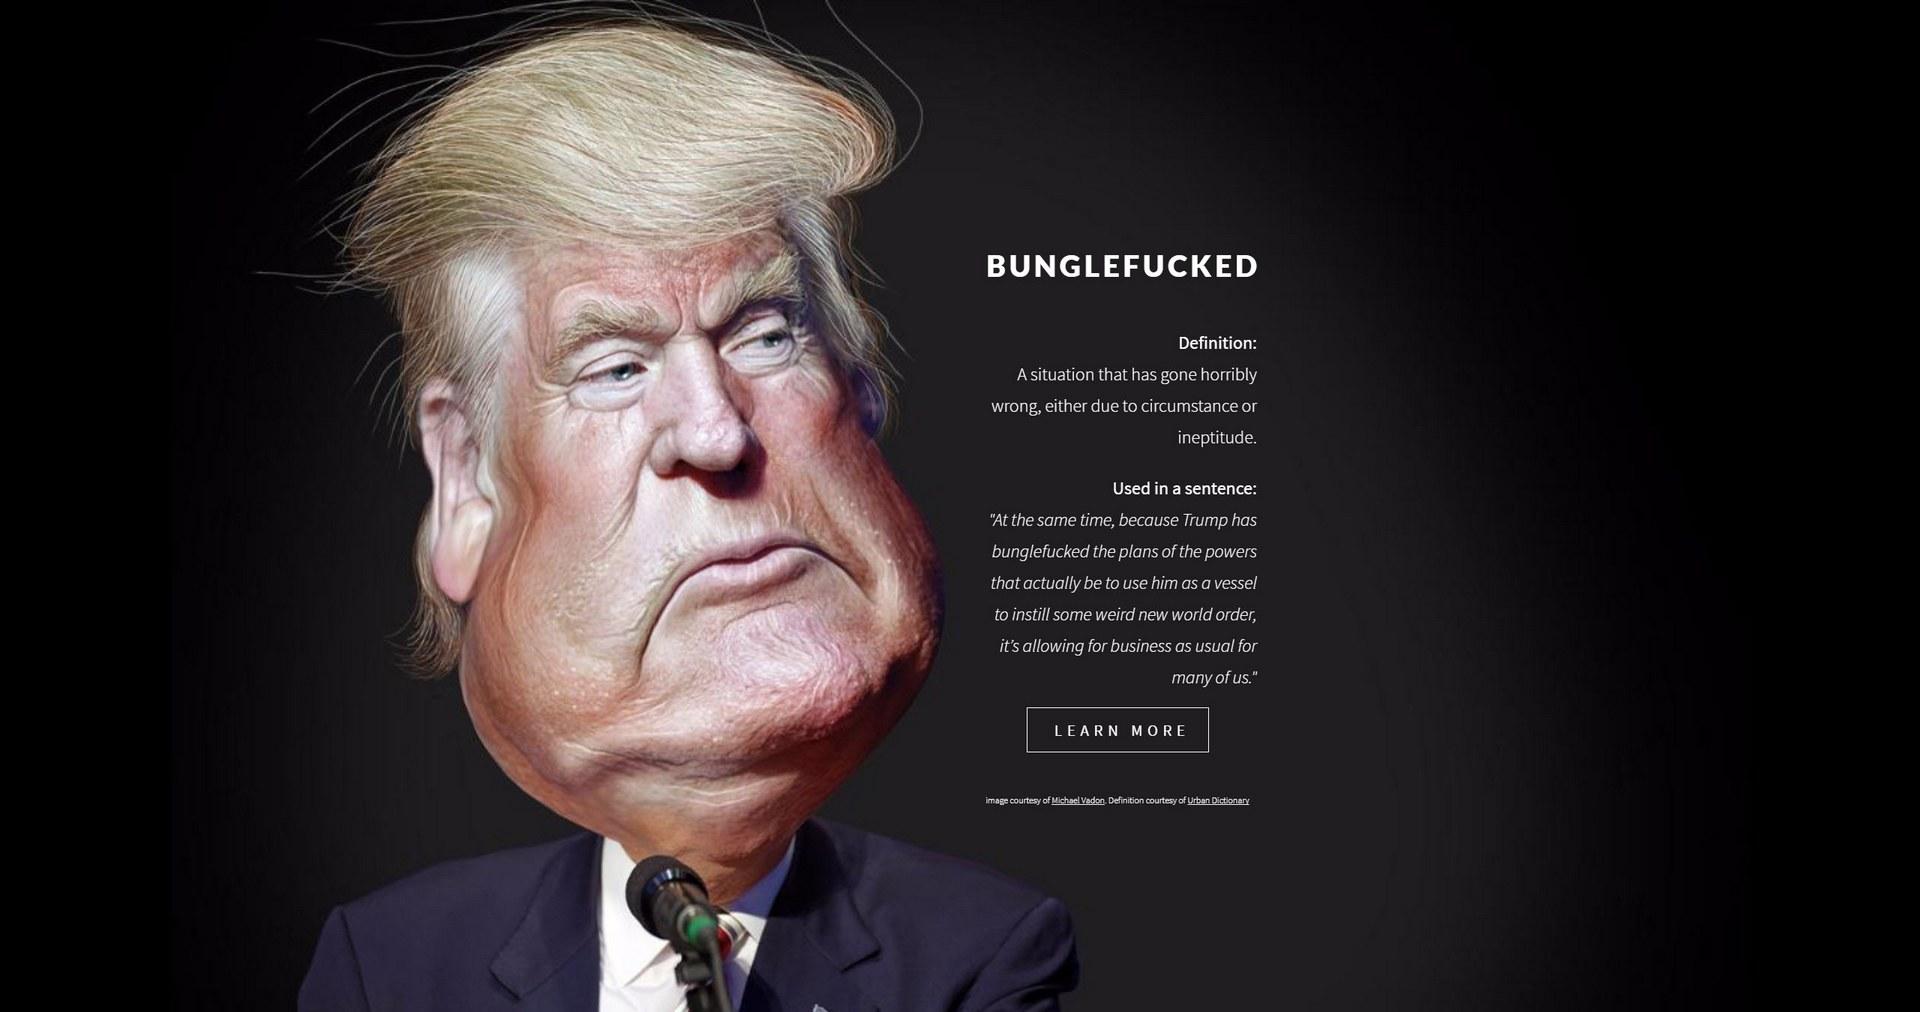 bunglefucked.com website created with Carrd.co